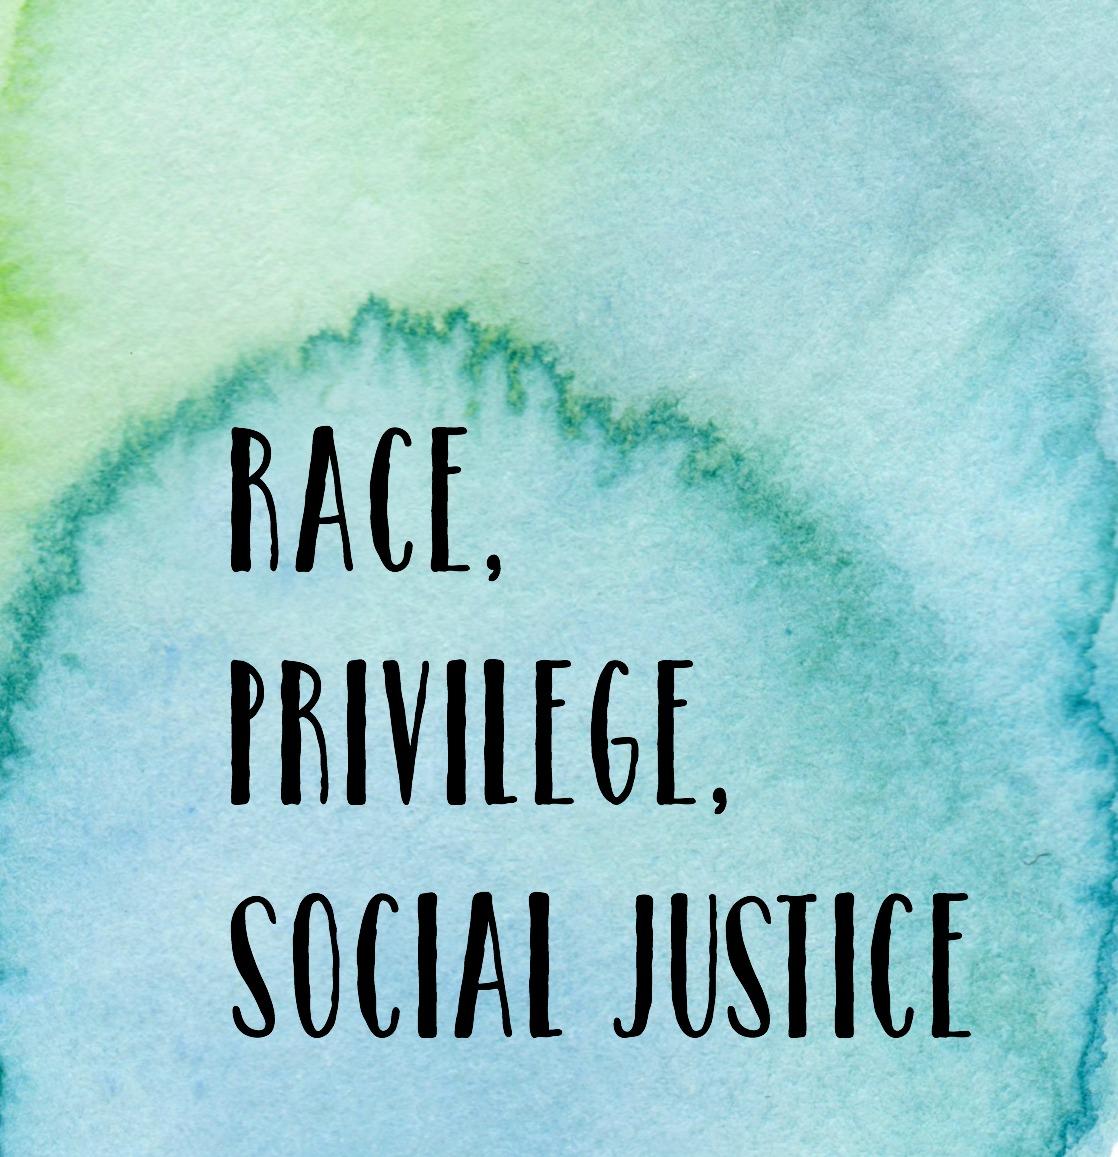 RacePrivilegeSocialJustice.jpg